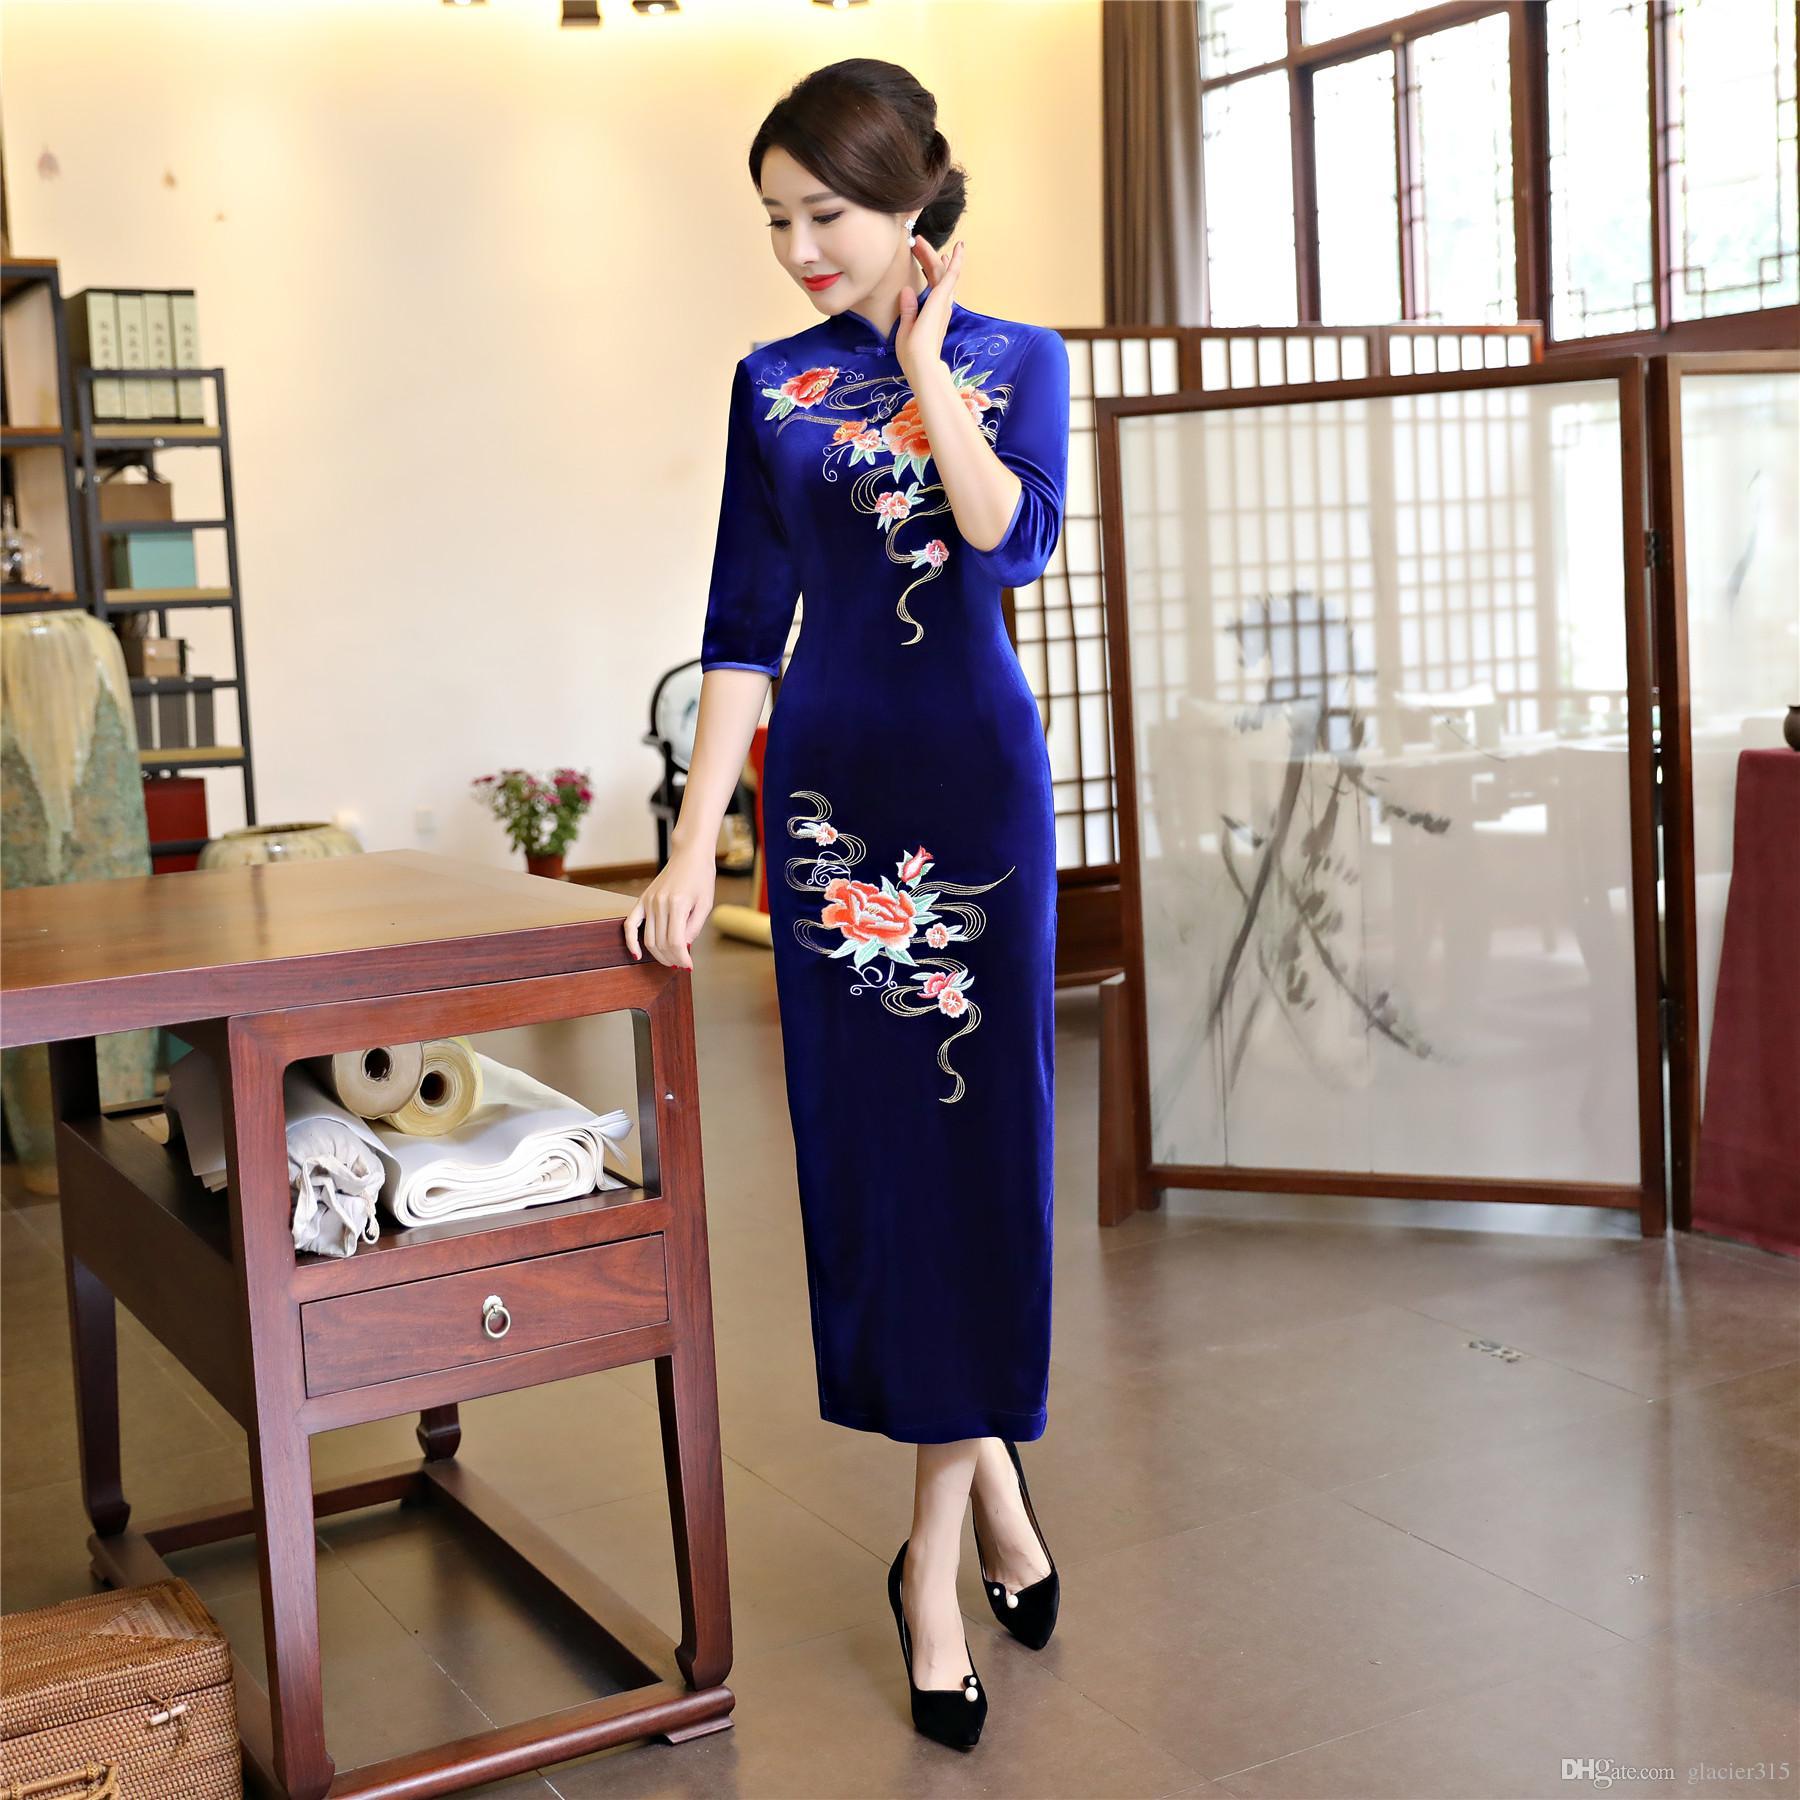 289c8ff440d37 Shanghai Story Flower Embroidery Velvet Half Sleeve Qipao Long Cheongsam  Chinese Traditional Dress For Women Shift Dress Sundresses From Glacier315